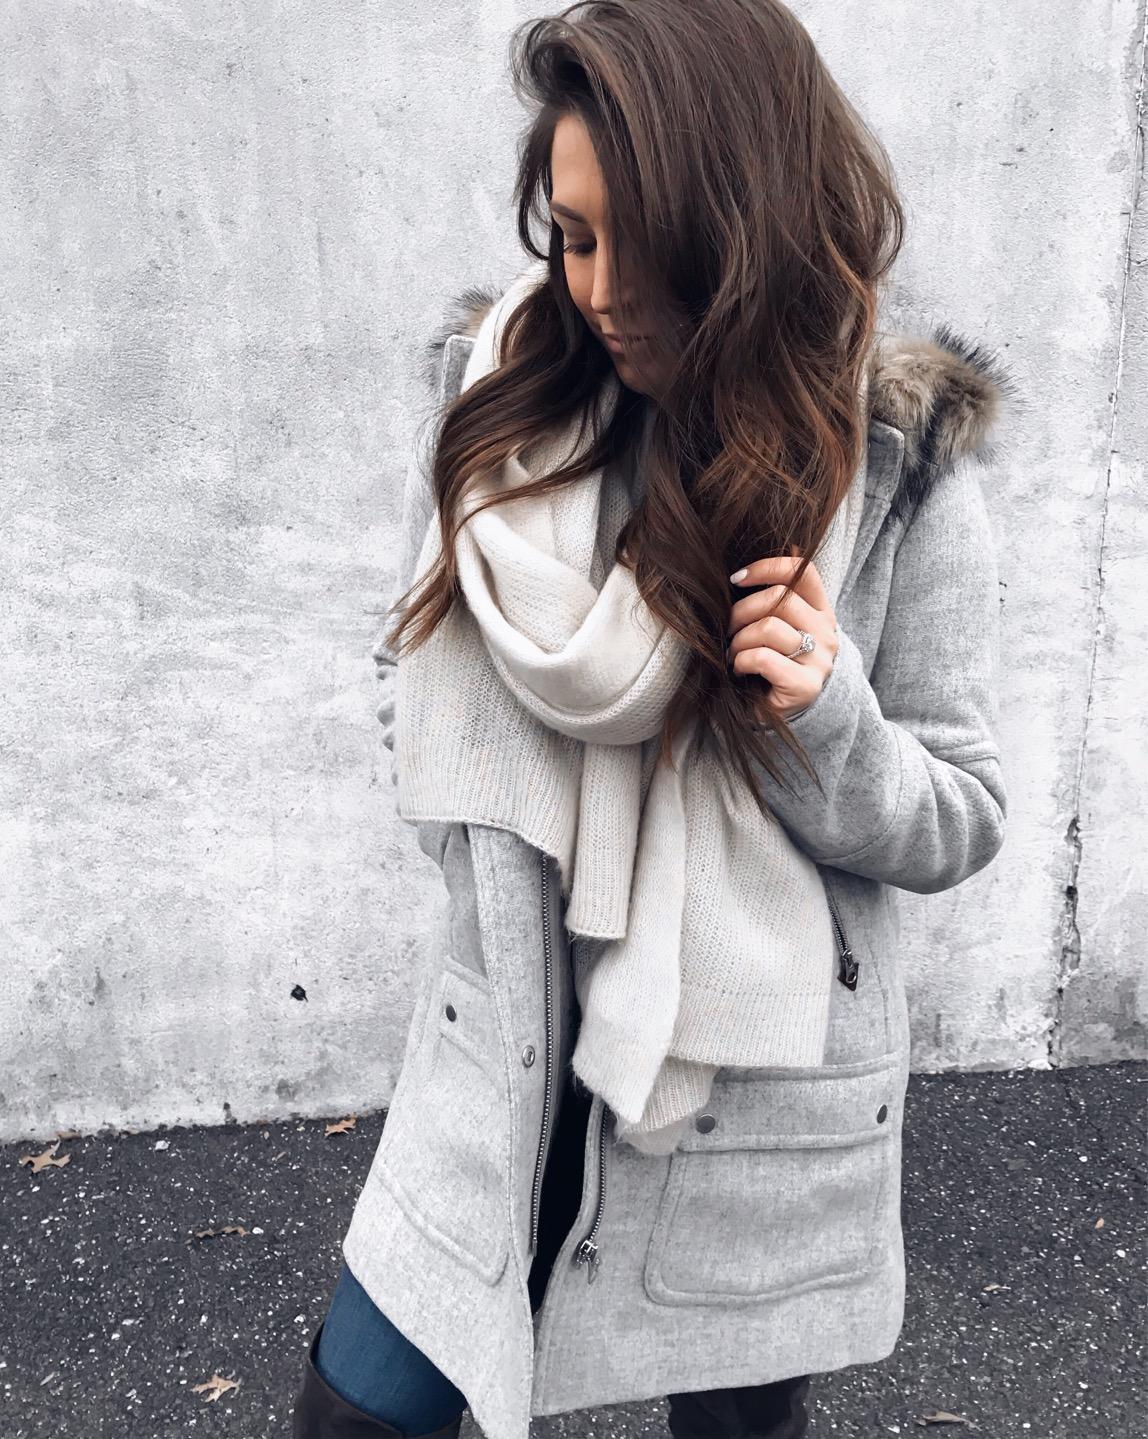 Weekend Sales & Instagram Round Up | Pine Barren Beauty | winter fashion, winter outfit idea, winter coat, jcrew coat, must have jcrew coat, free people scarf, winter essentials